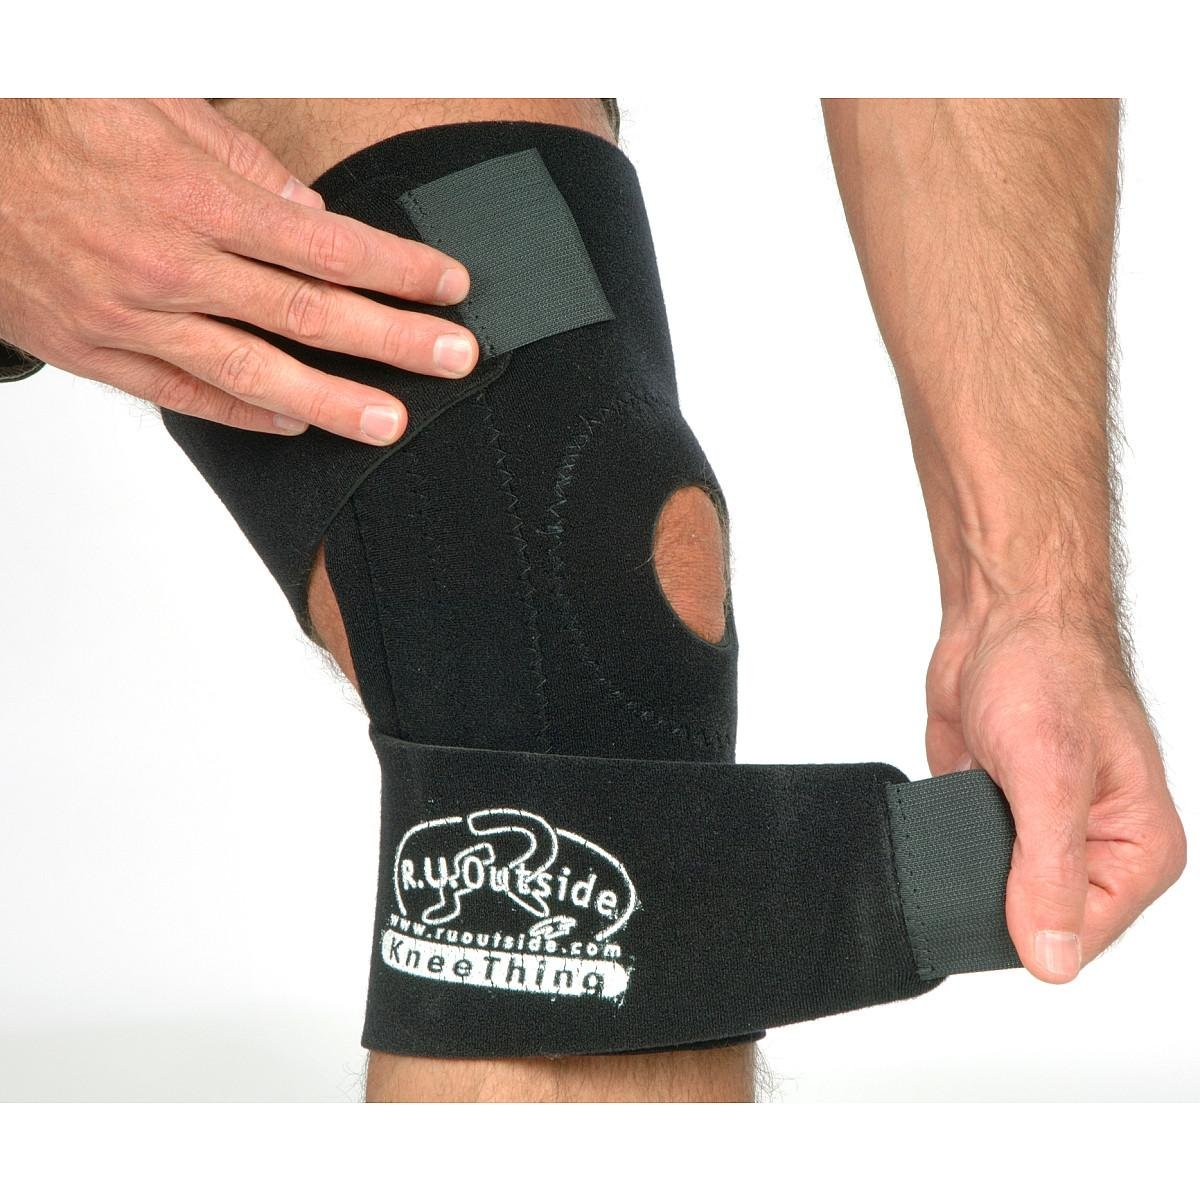 R.U.Outside Kneething - Knee Support, Medium/100-220-Pound, Black